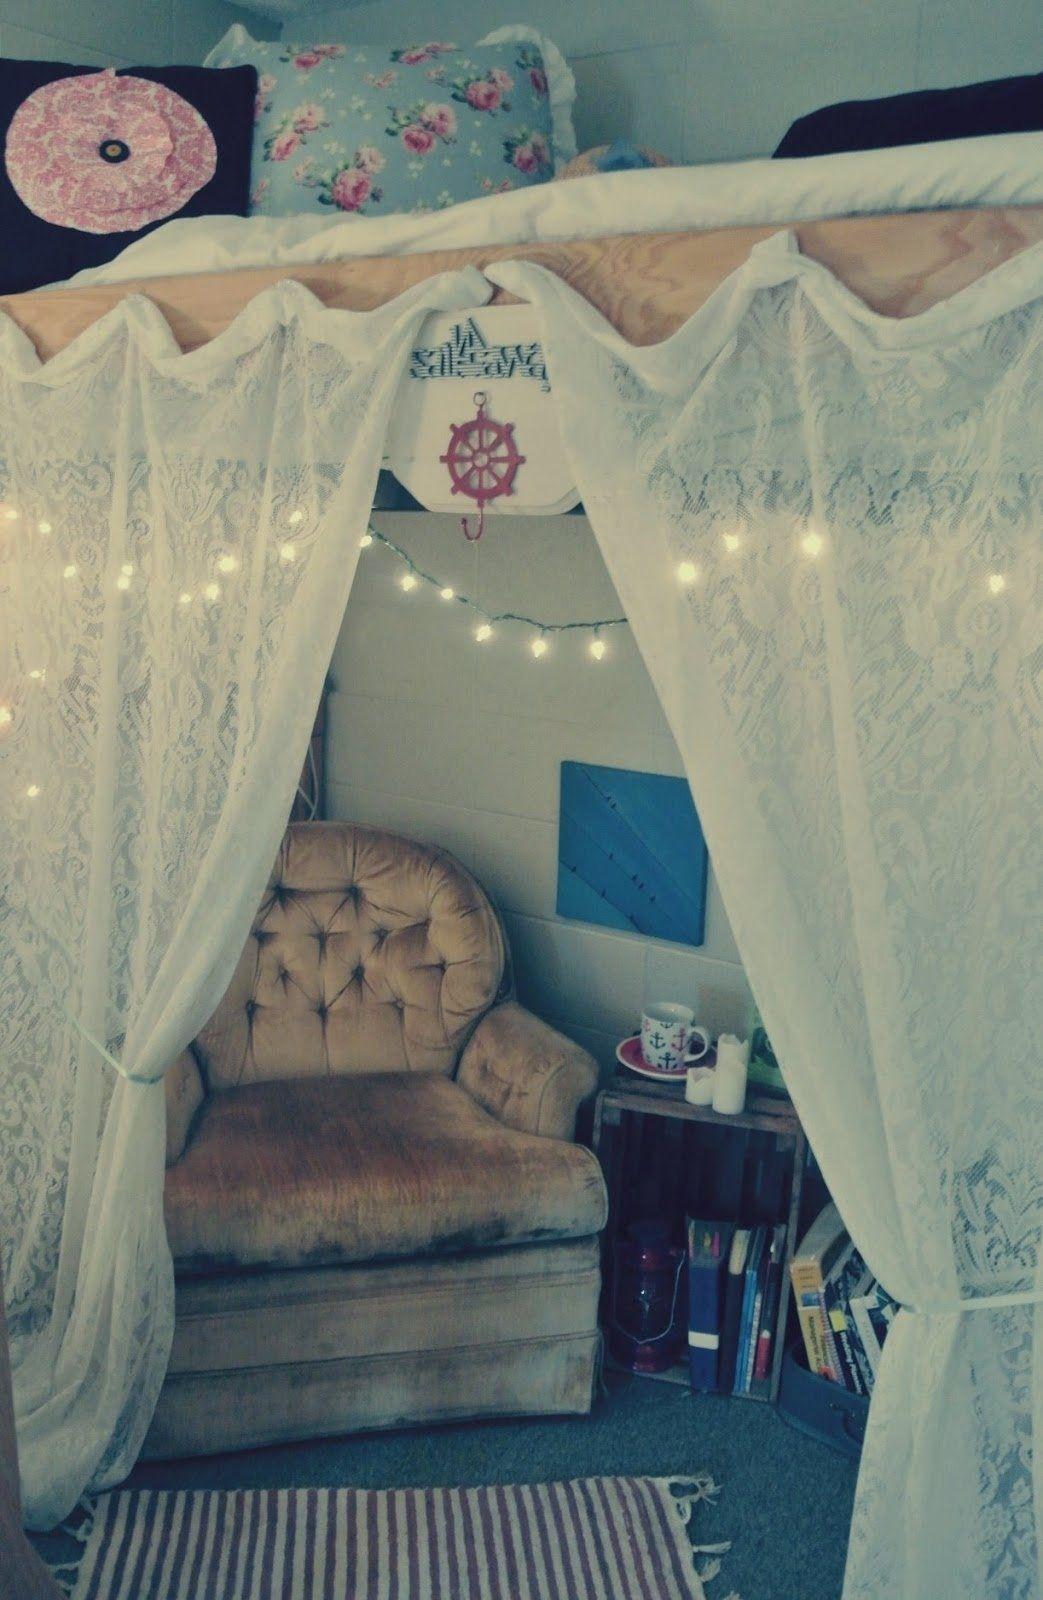 Dorm Room Loft Beds: Dorm Room, Dorm Hacks, College Room